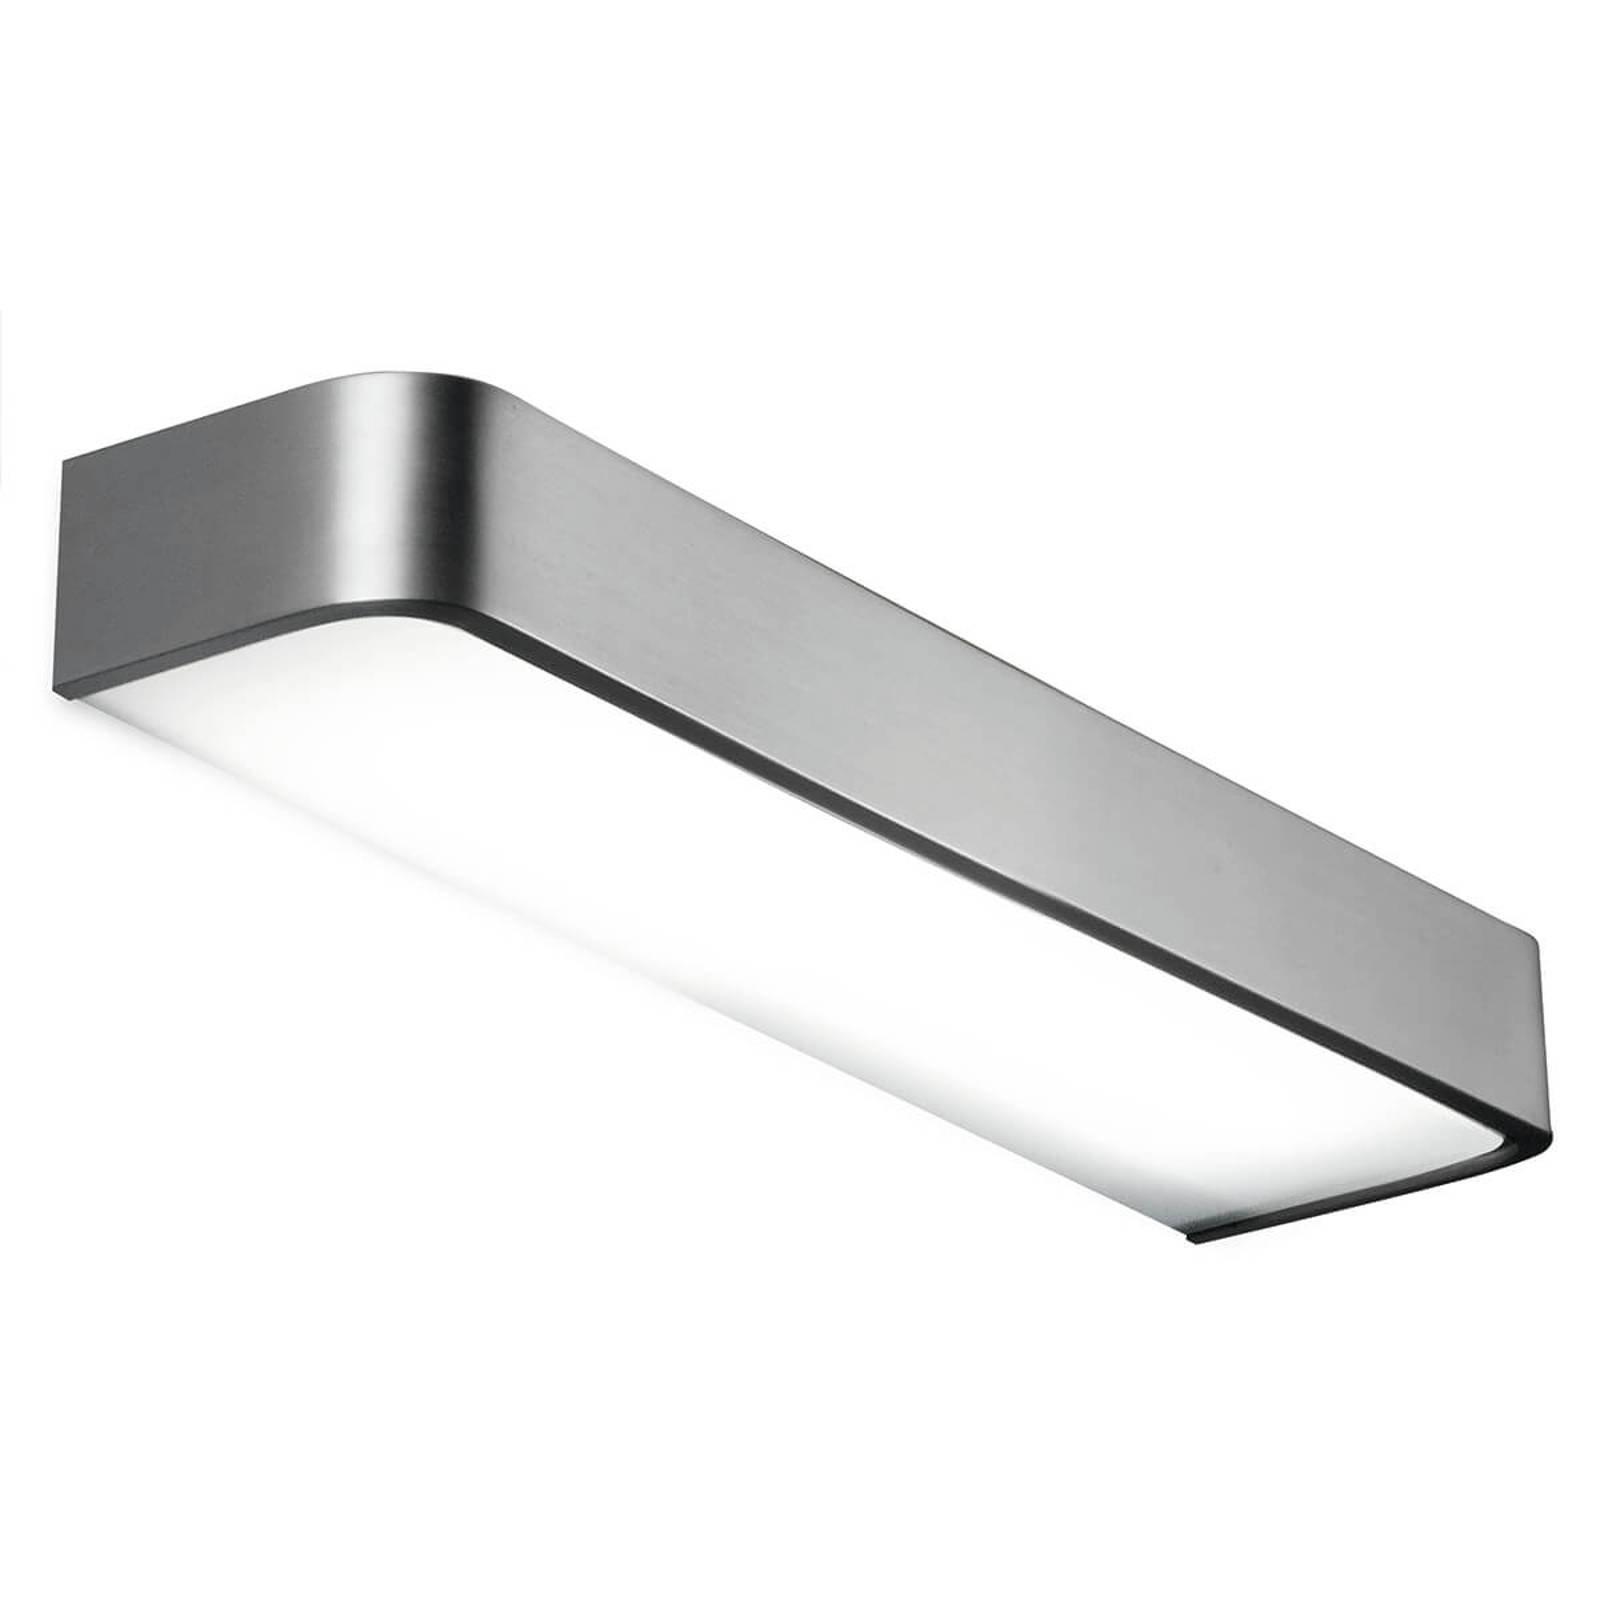 Baderom-vegglampe Arcos med LED, 60 cm nikkel